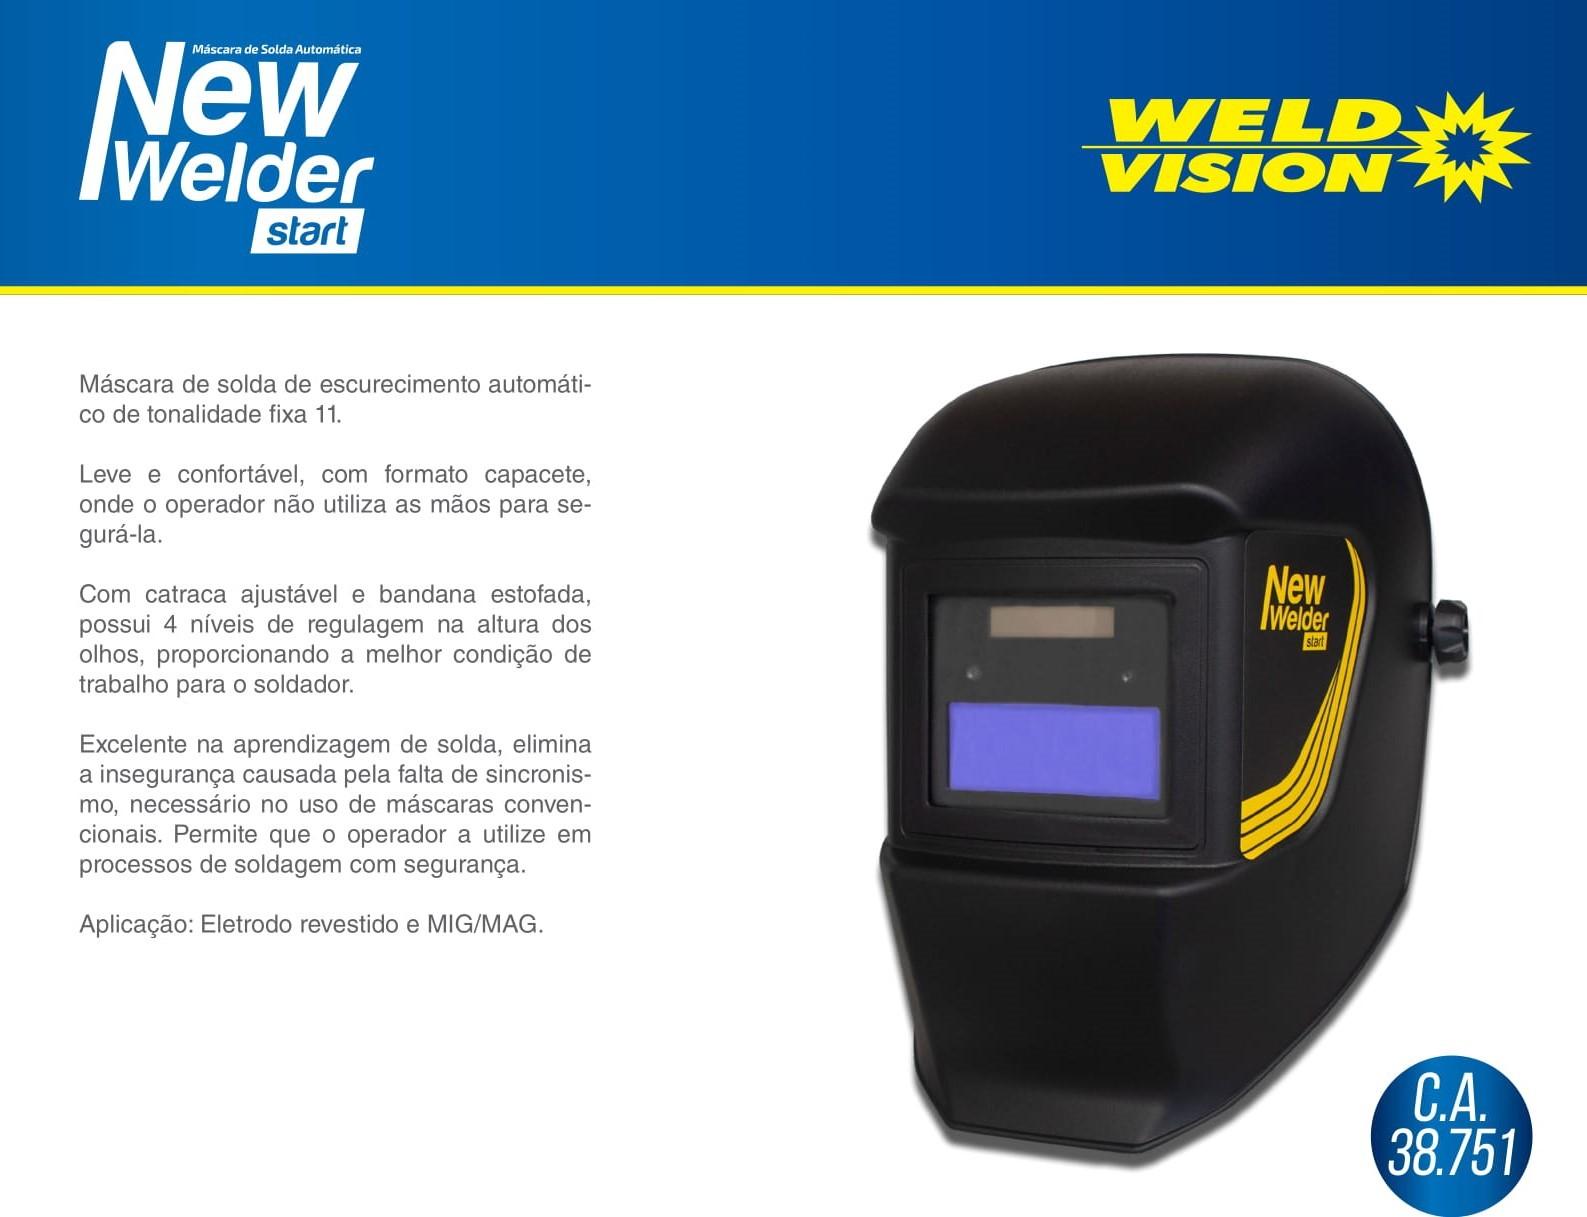 Máscara de Solda Automática Start New Welder WELD VISION